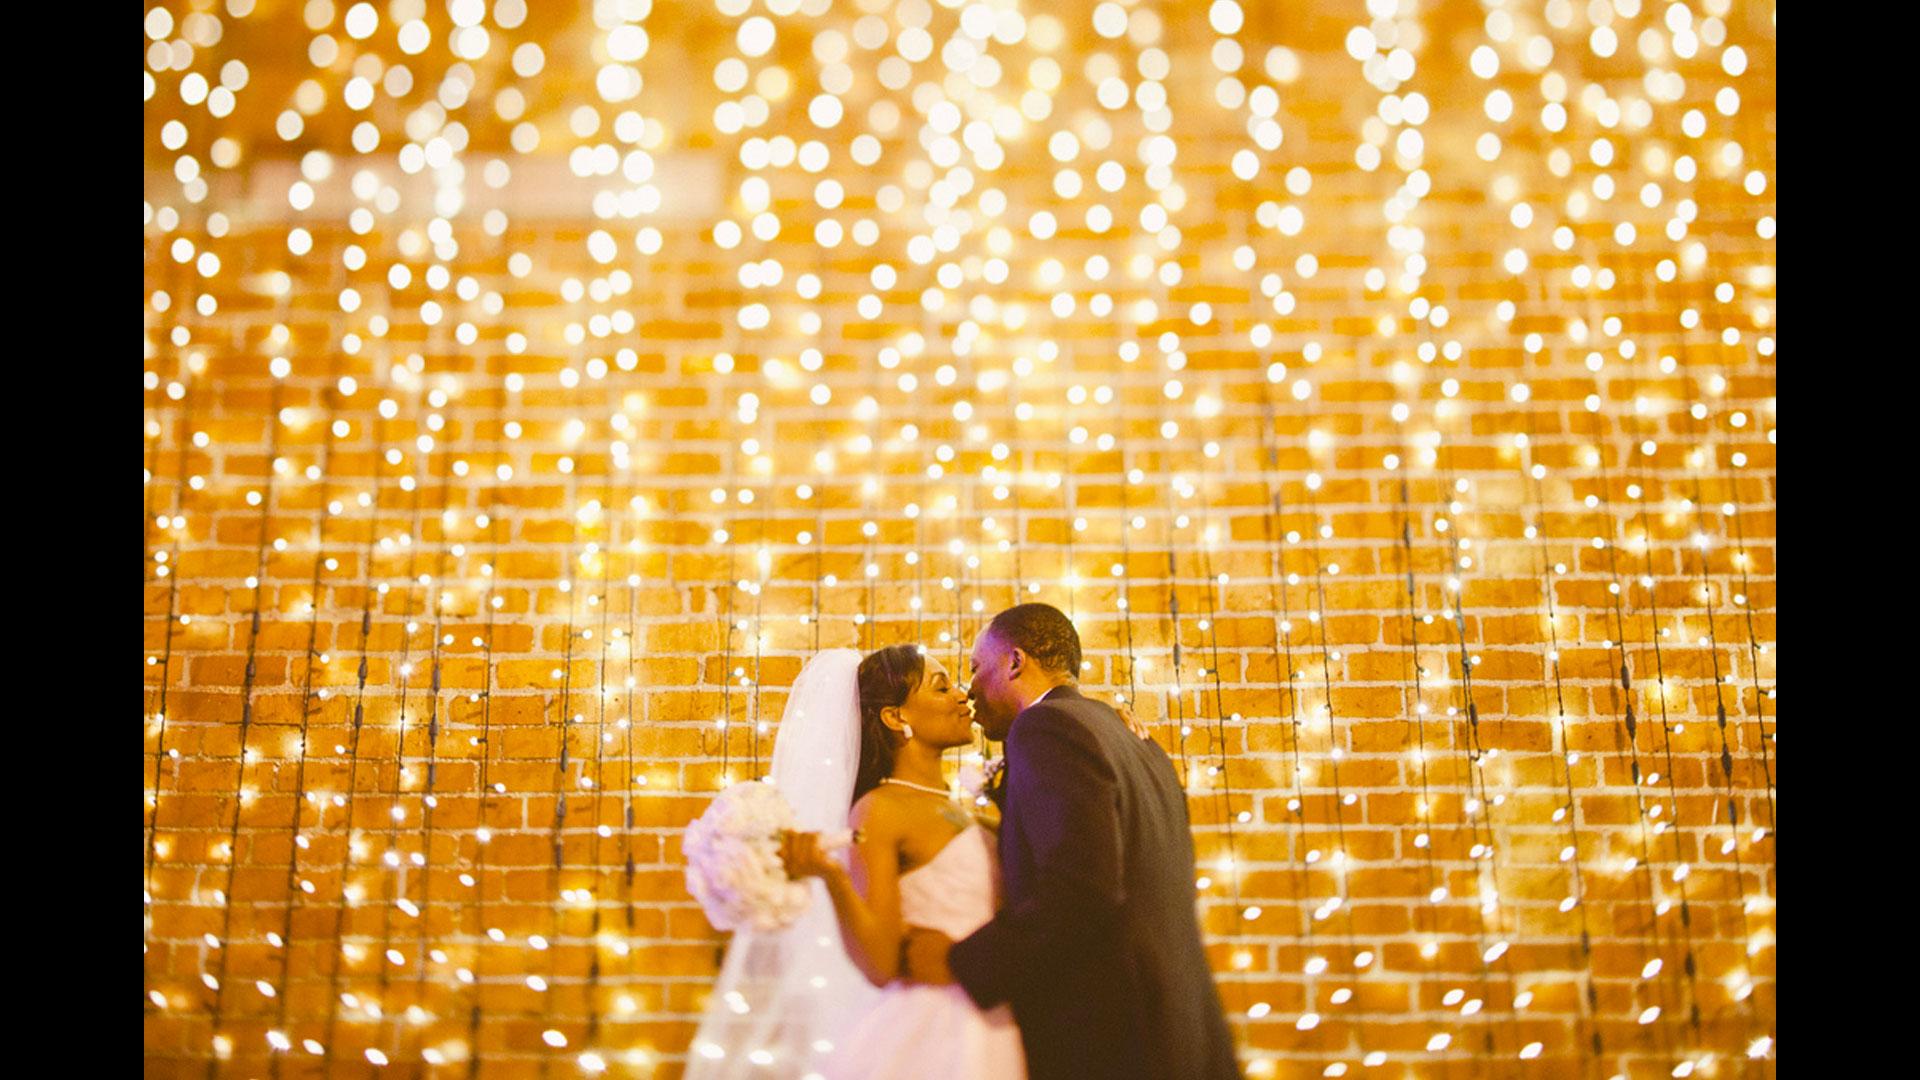 Weddings | Photographer: Ryan SouthenCurator: Bryan Esler